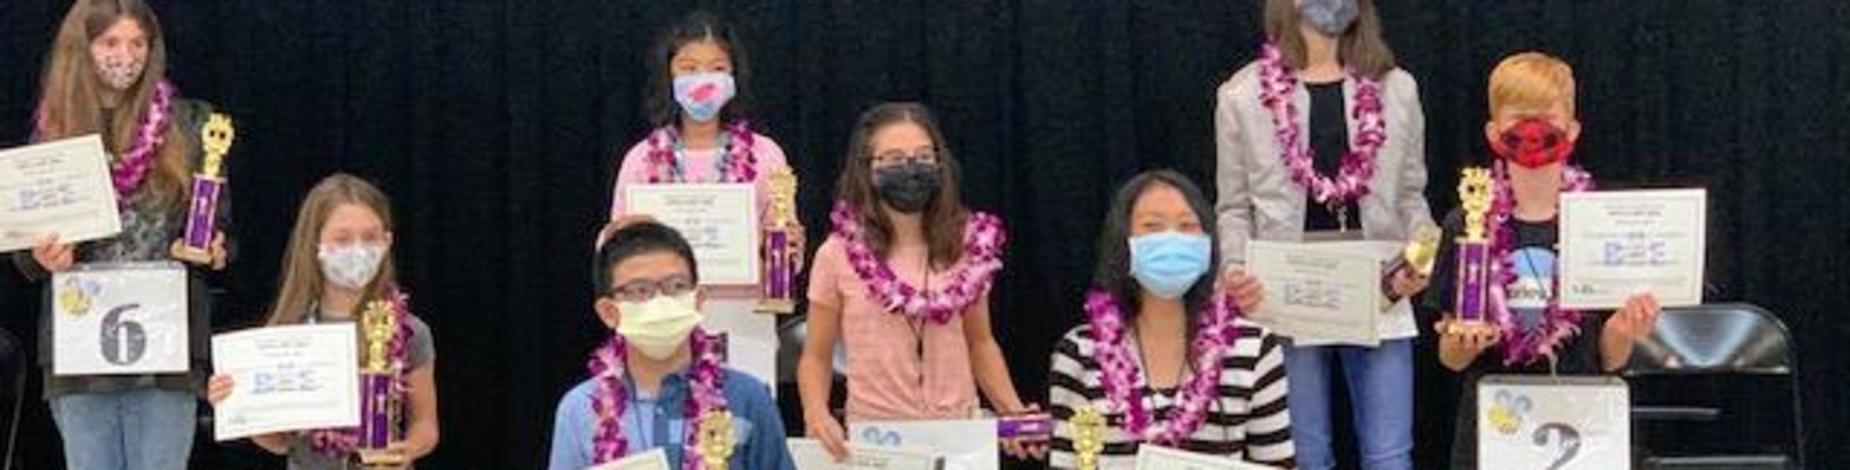 Audrey Jones and Stefhanie Sambrano represented Kilauea School at the Kauai District  Spelling Bee